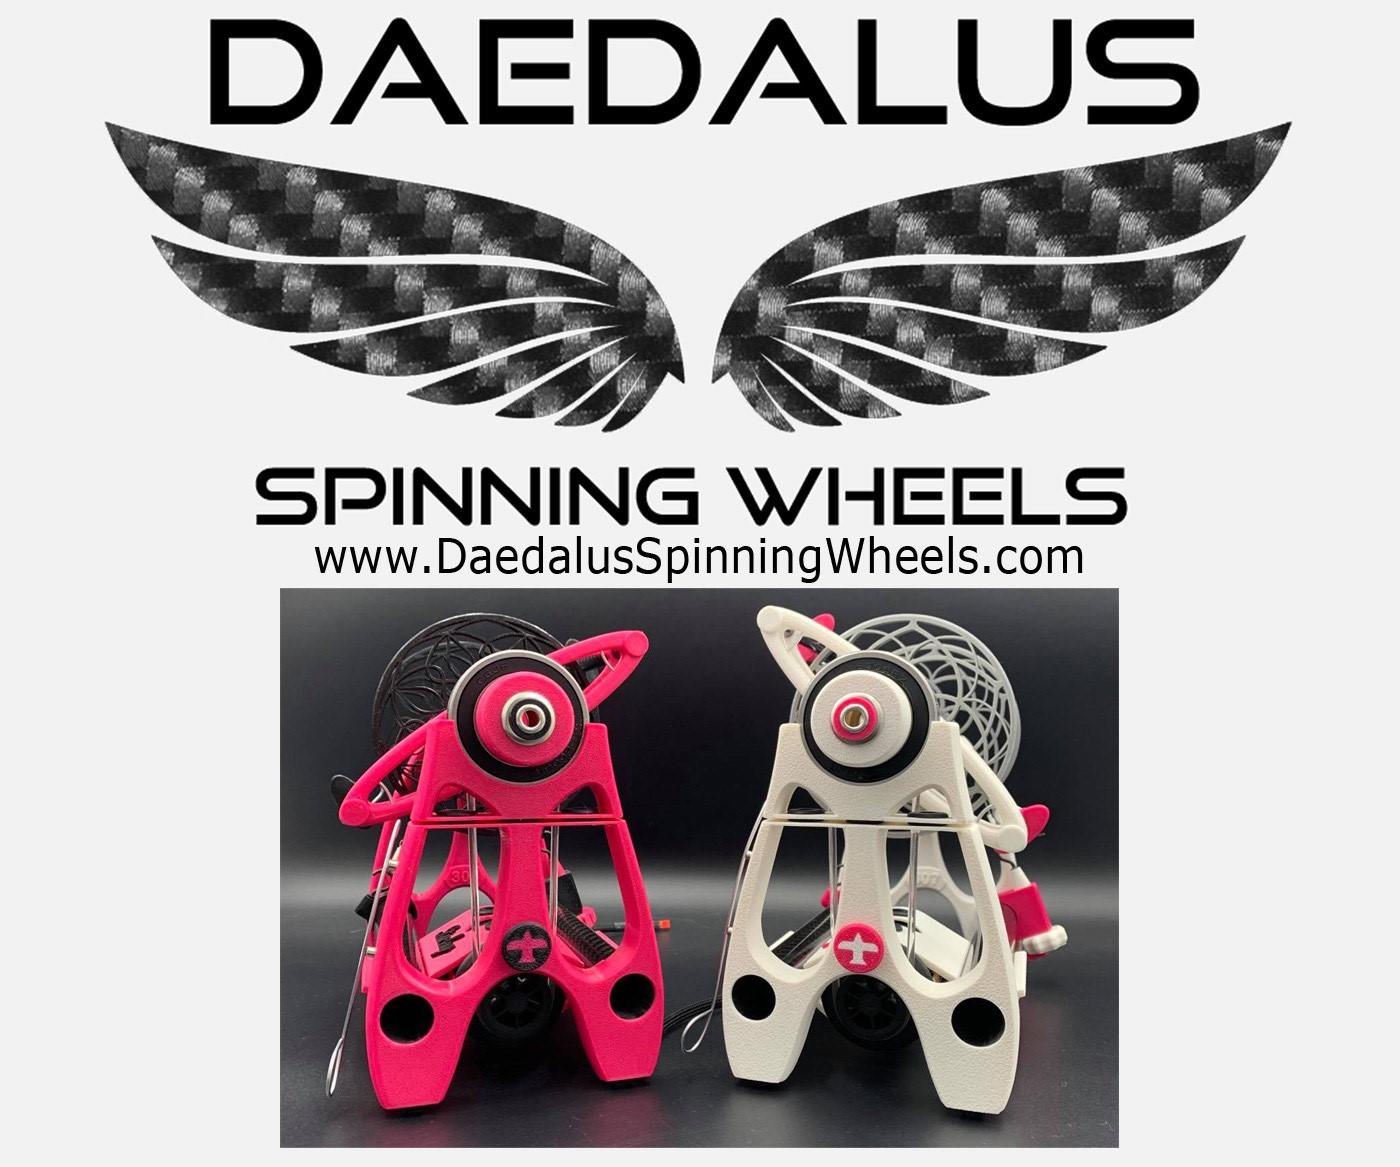 Daedalus Spinning Wheels